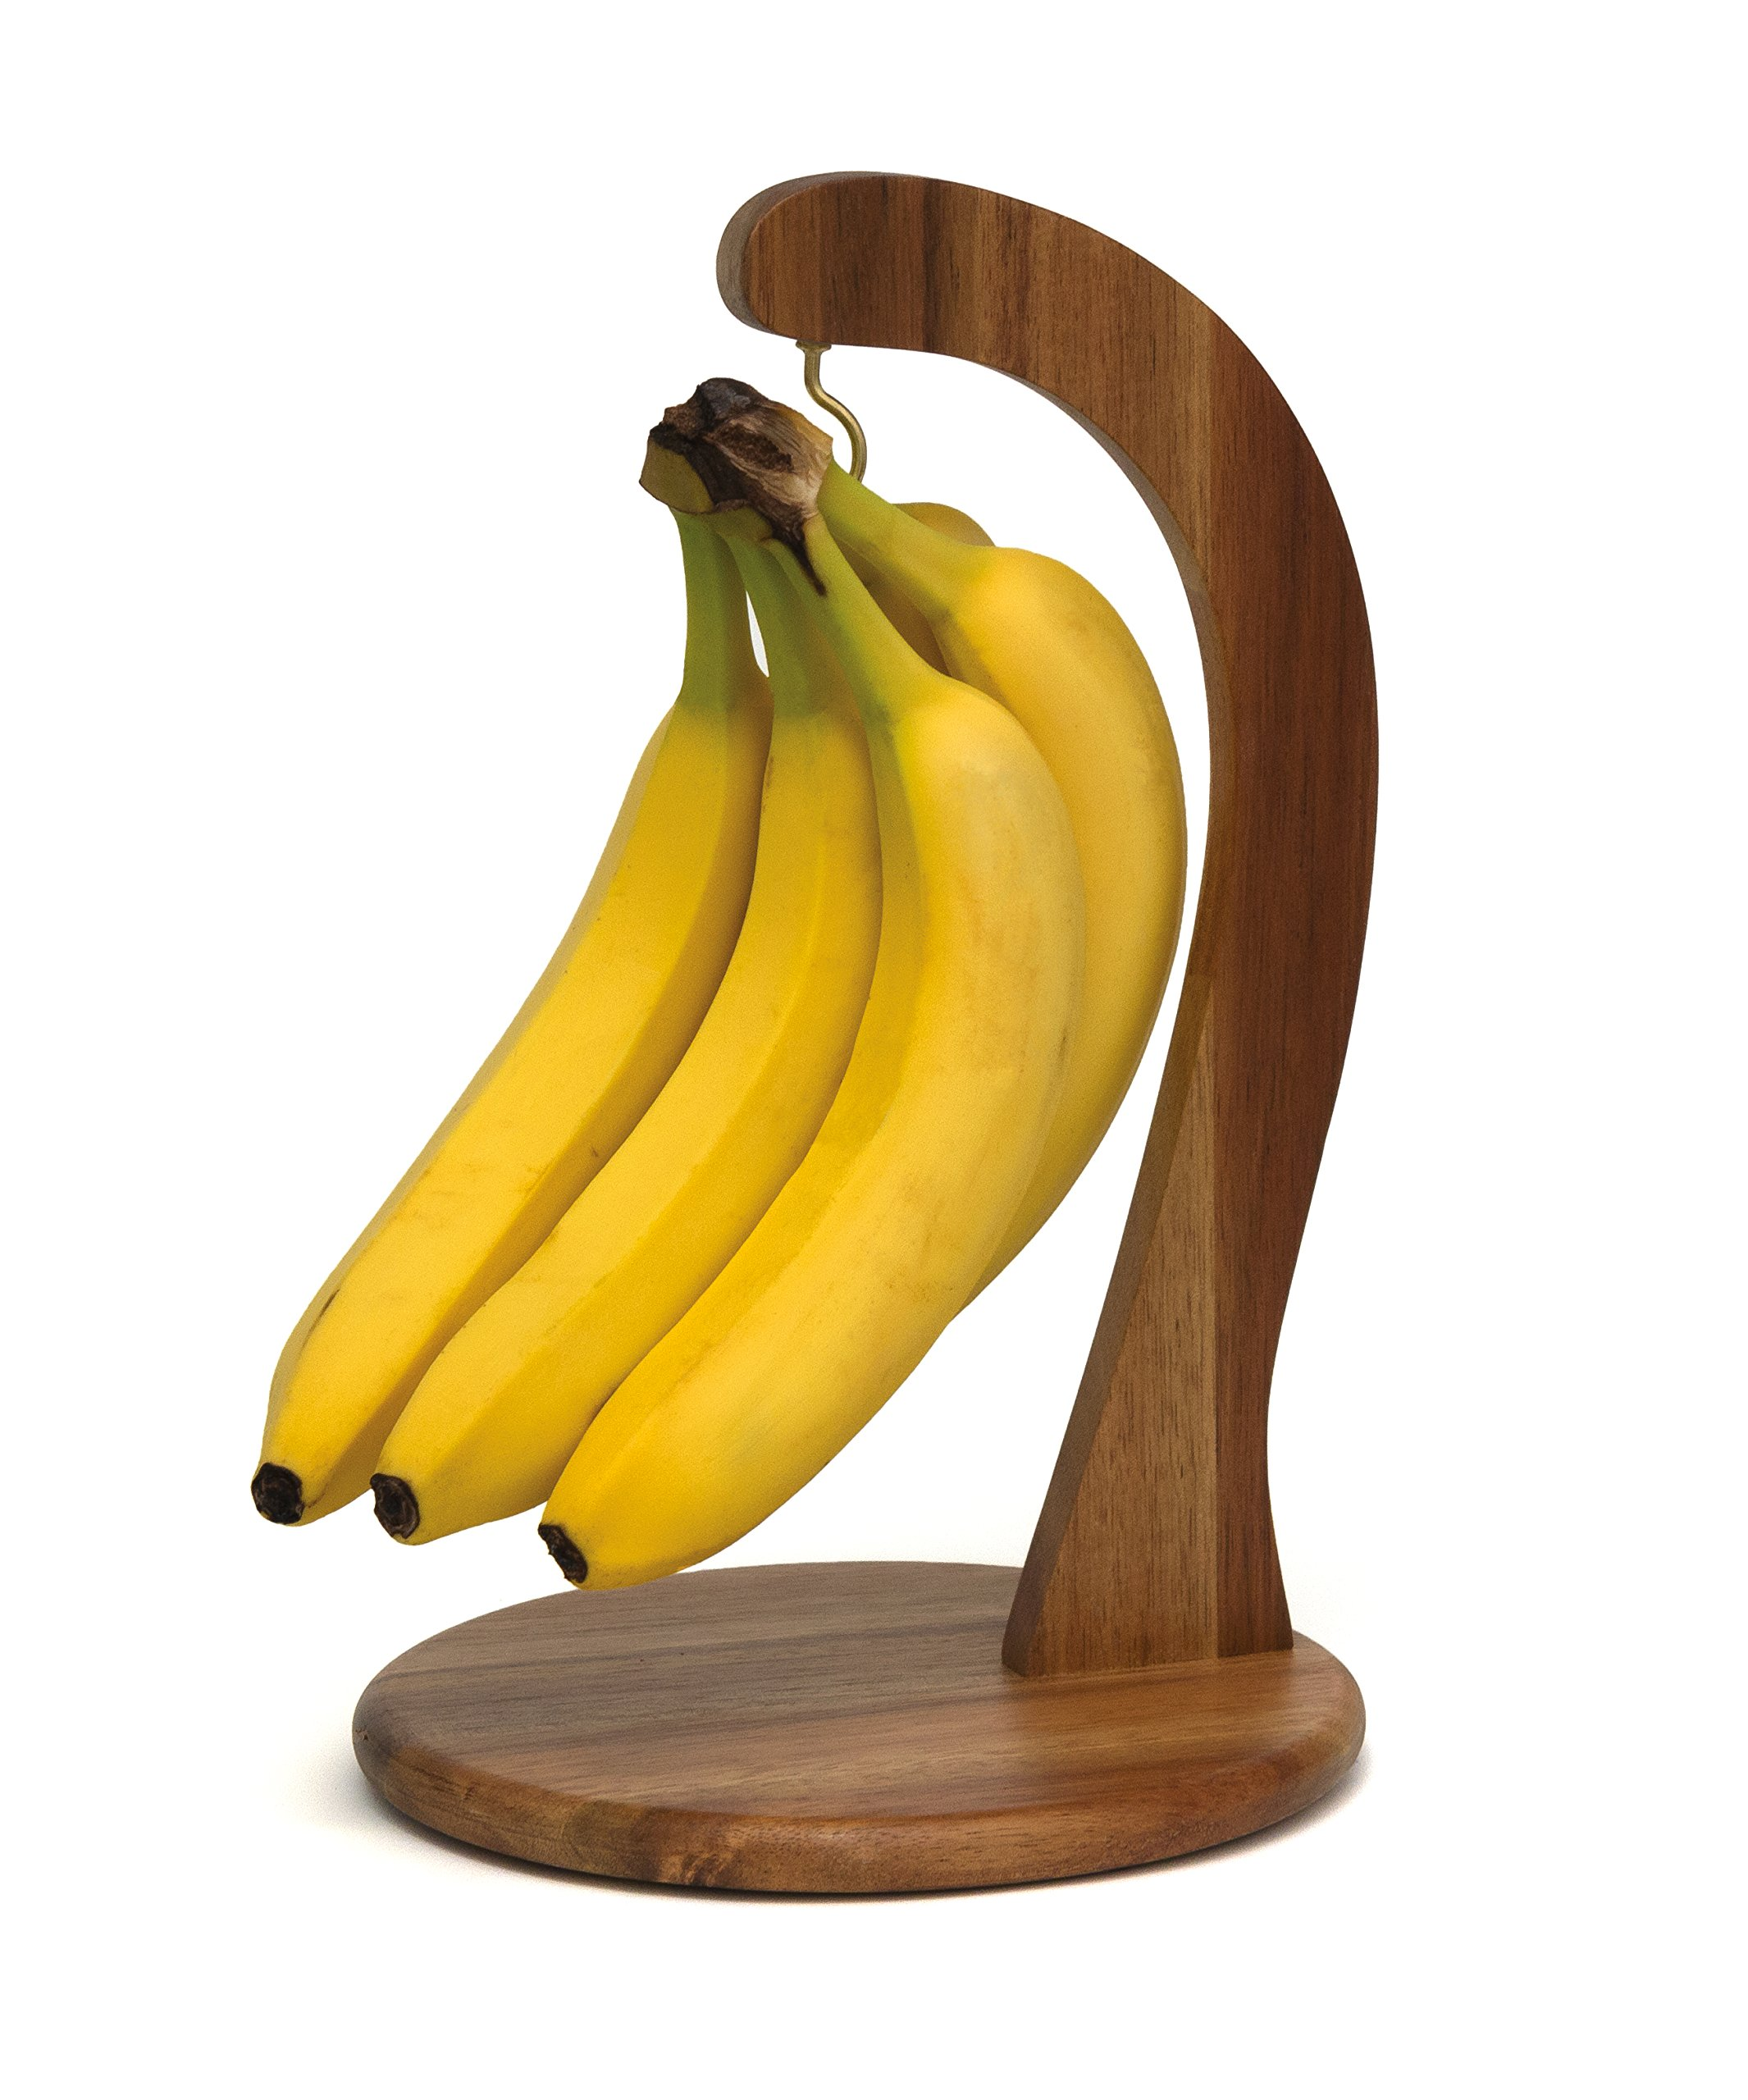 Lipper International 1156 Acacia Wood Banana Hanger, 7-1/4'' x 11-1/4'' by Lipper International (Image #2)